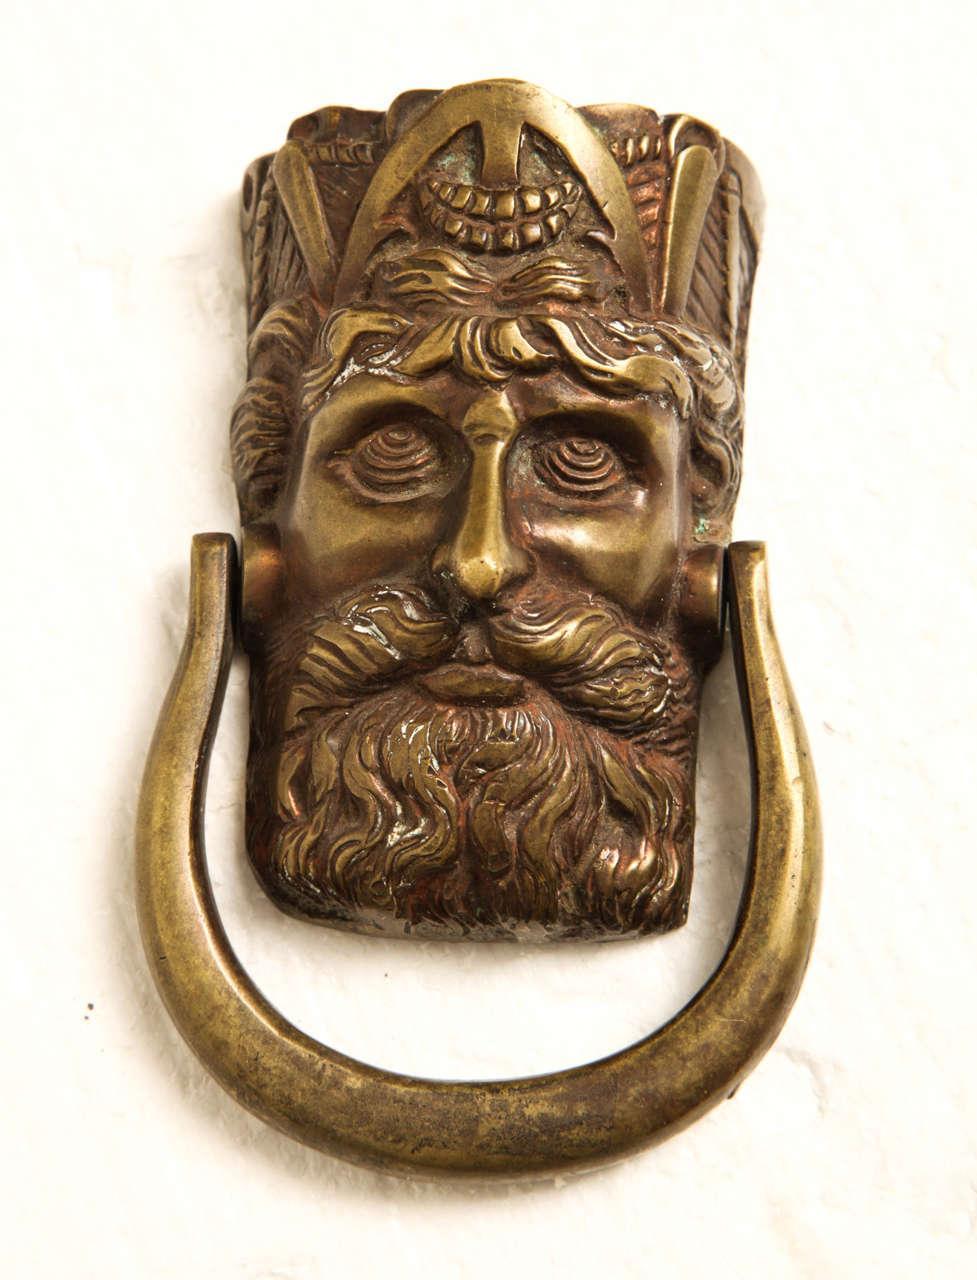 19th Century Irish Figural Door Knocker For Sale At 1stdibs